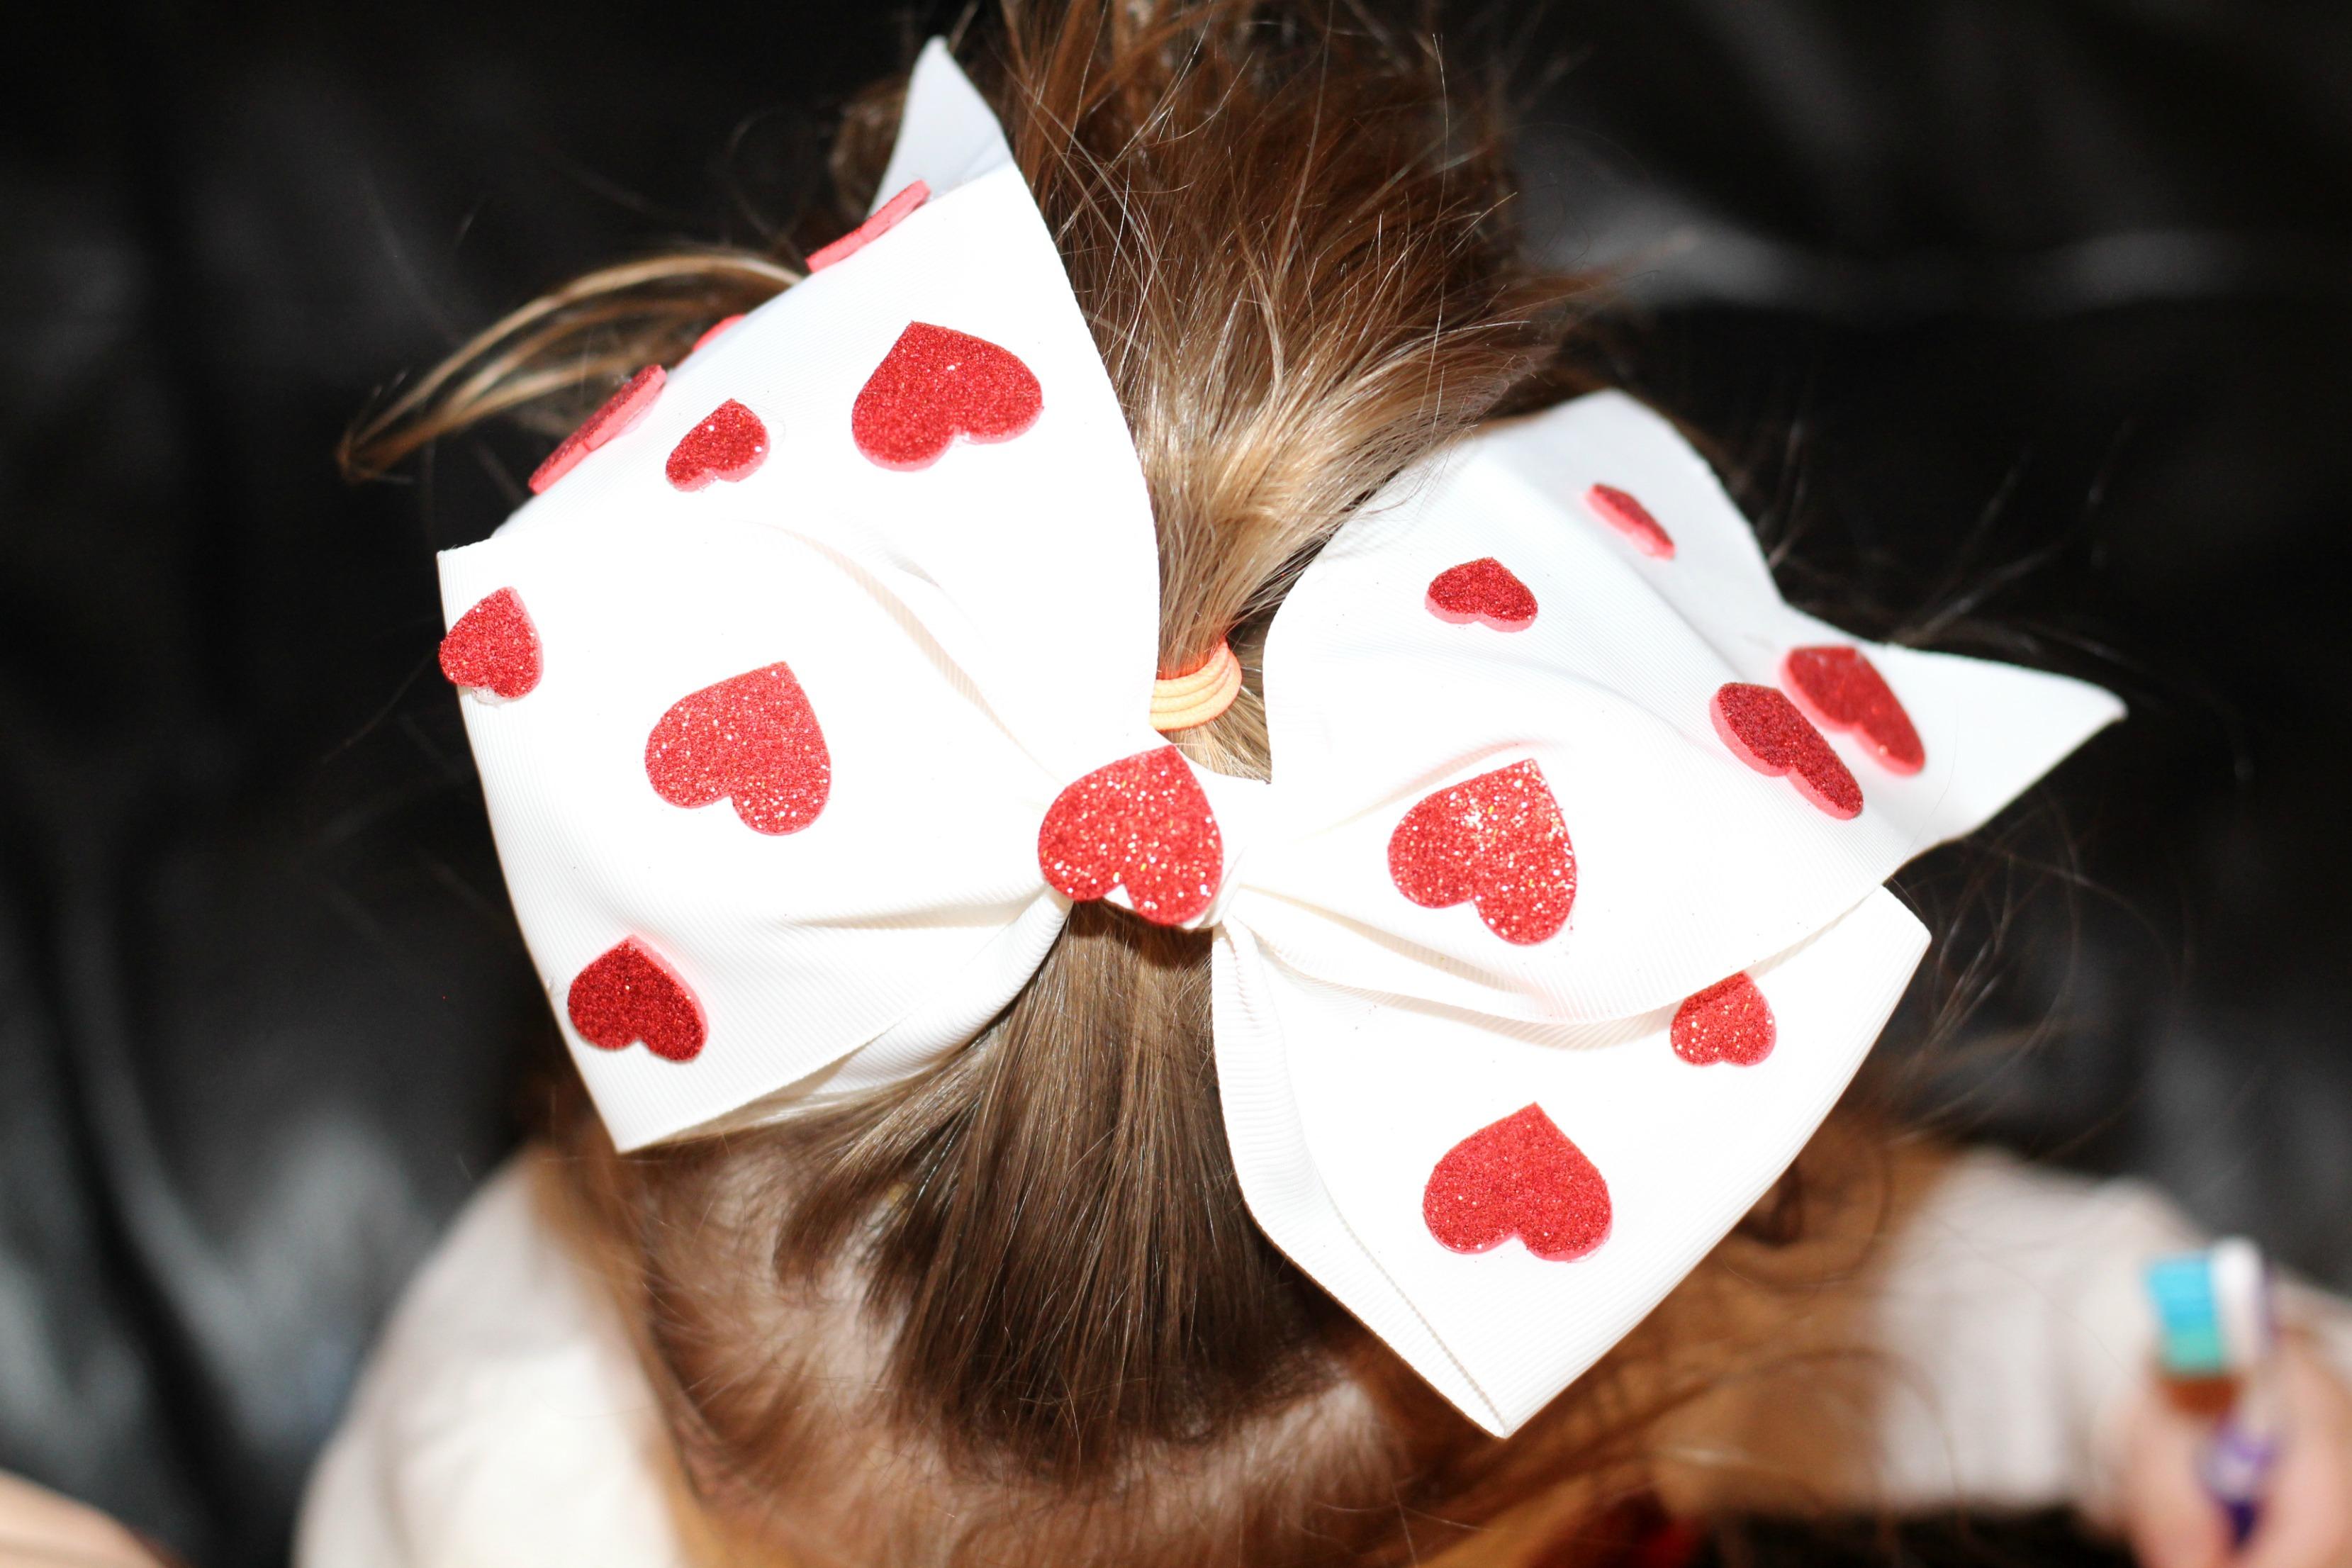 DIY Heart Hair Bow Inspired by Amazon's Creative Galaxy